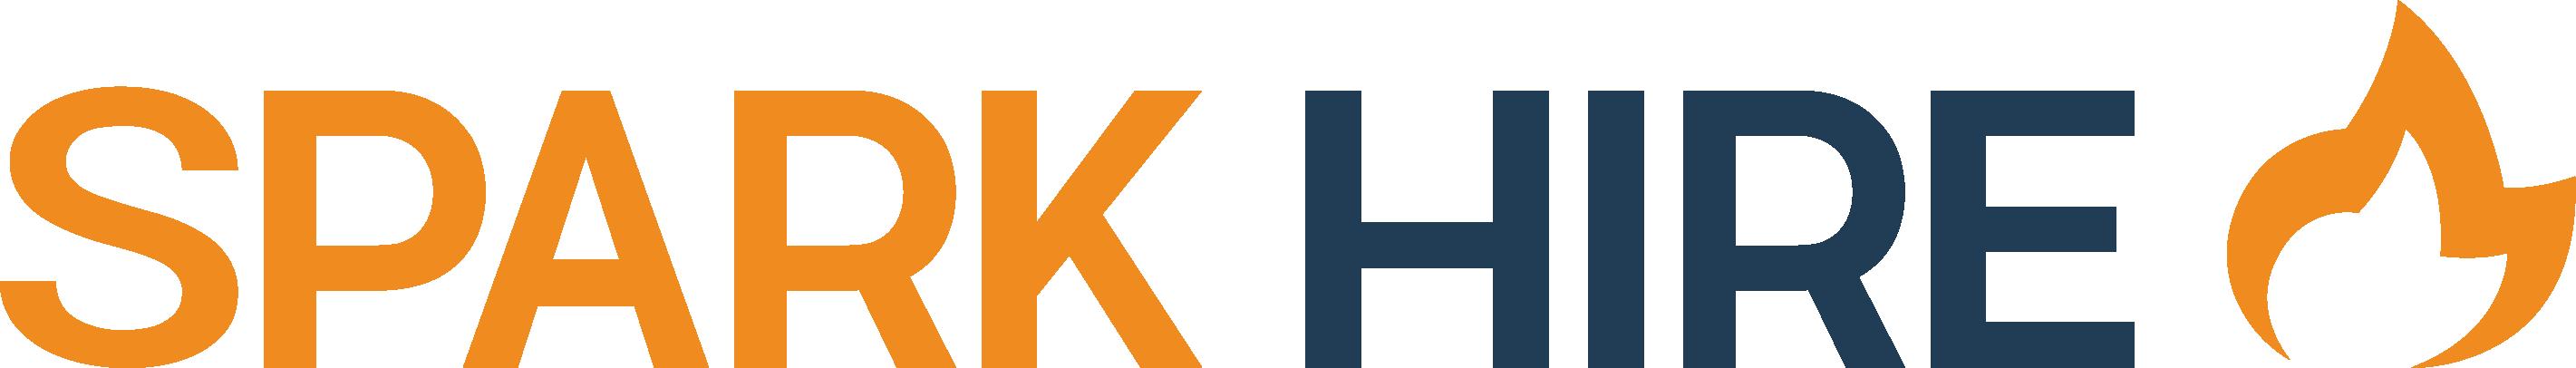 Spark Hire Logo - Orange and Blue.png